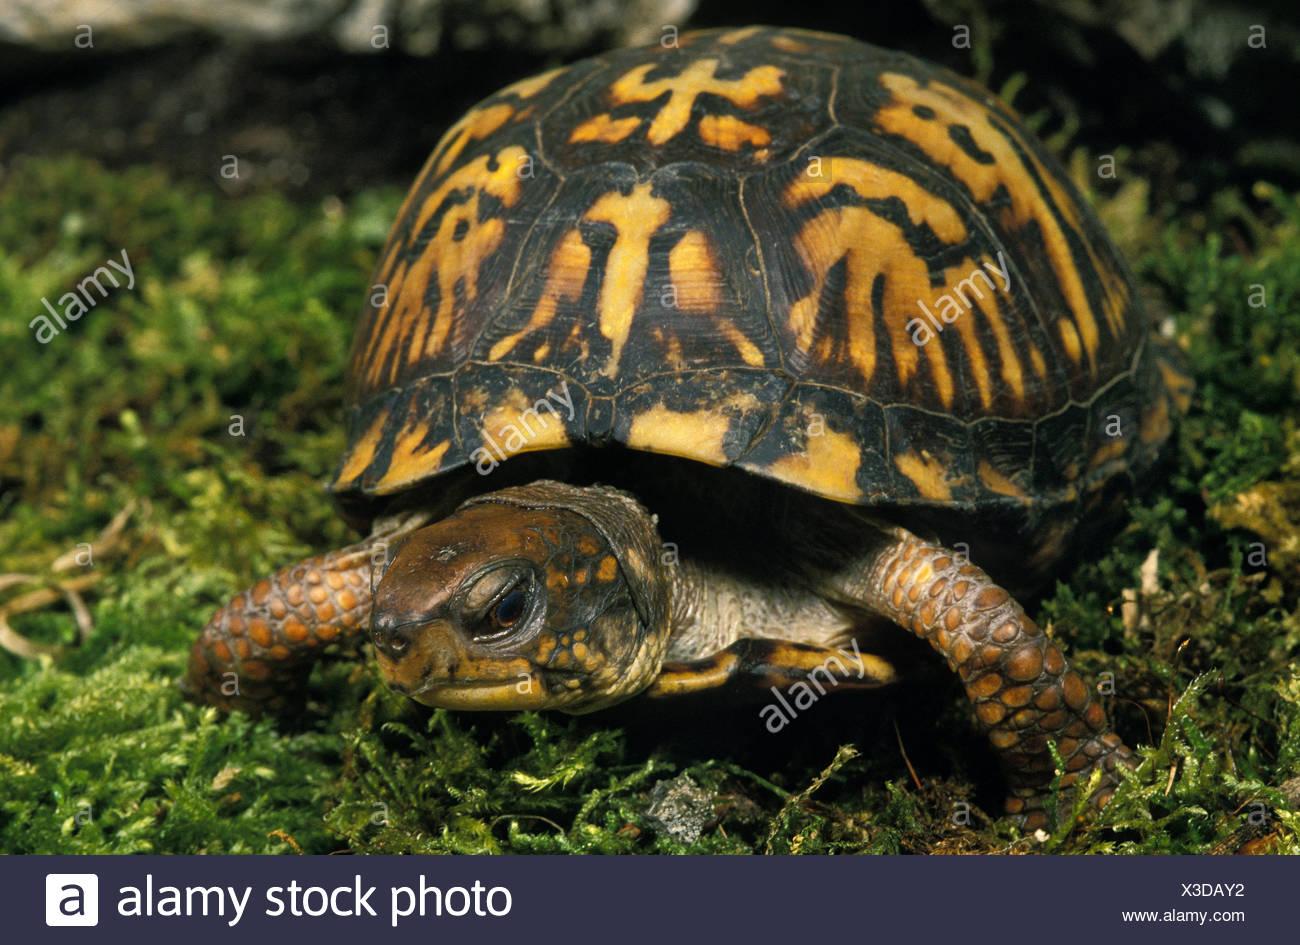 Eastern Box Turtle, terrapene carolina, Adult on Moss - Stock Image